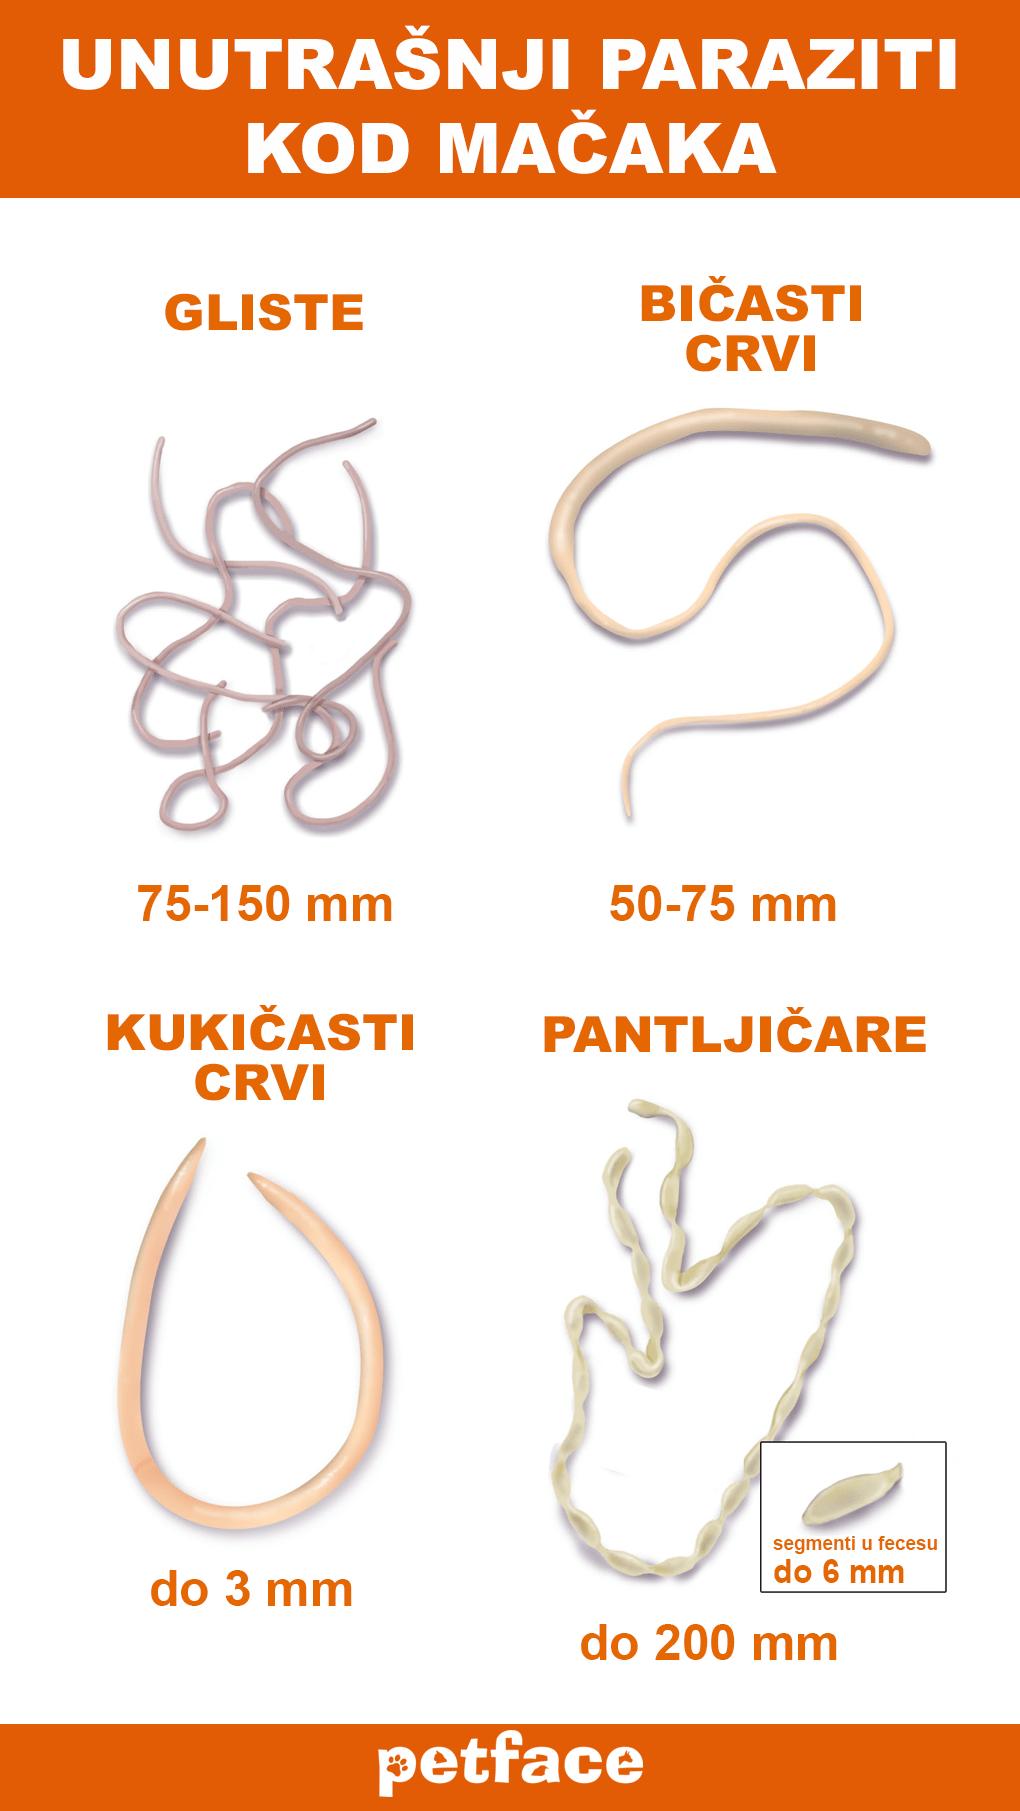 paraziti kod macaka slike)